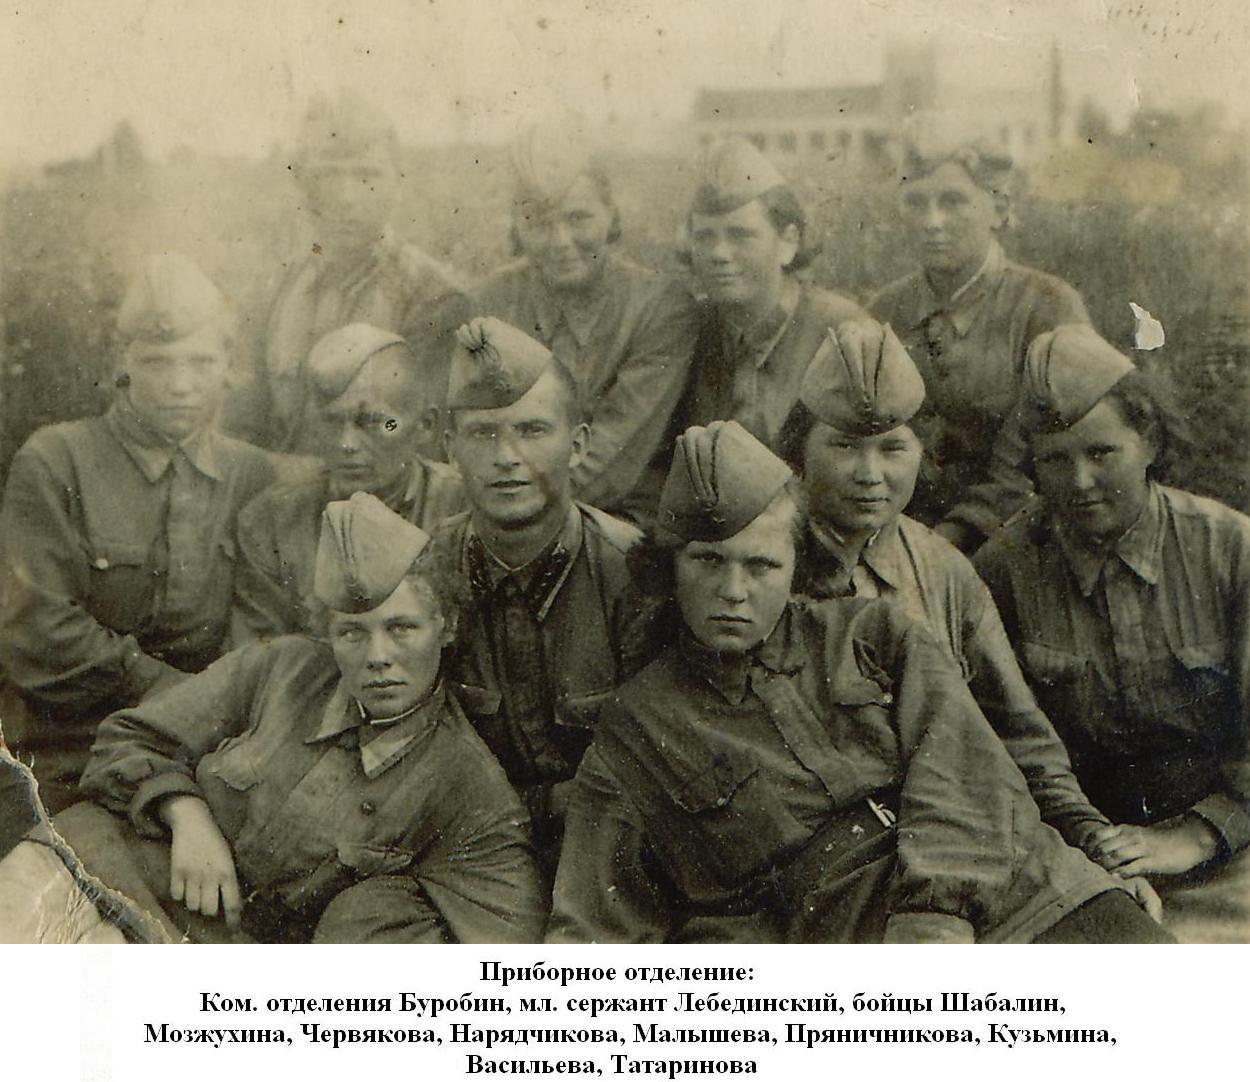 http://historyofuglitch.narod.ru/62_divizion/02.JPG